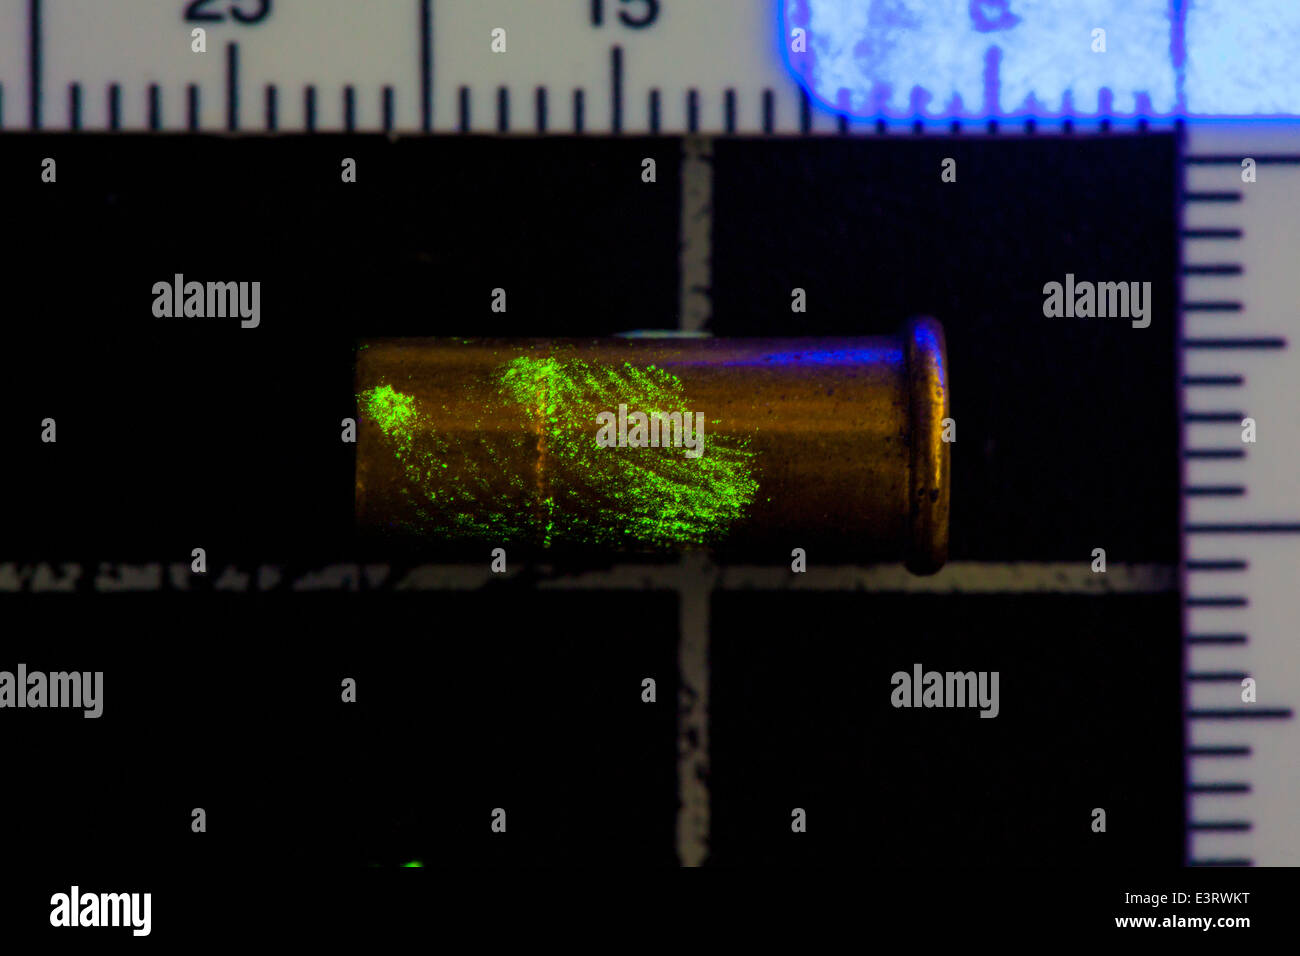 Florescence dyed enhanced fingerprint ridge detail on .22 ammunition casing illuminated with ultraviolet light - Stock Image